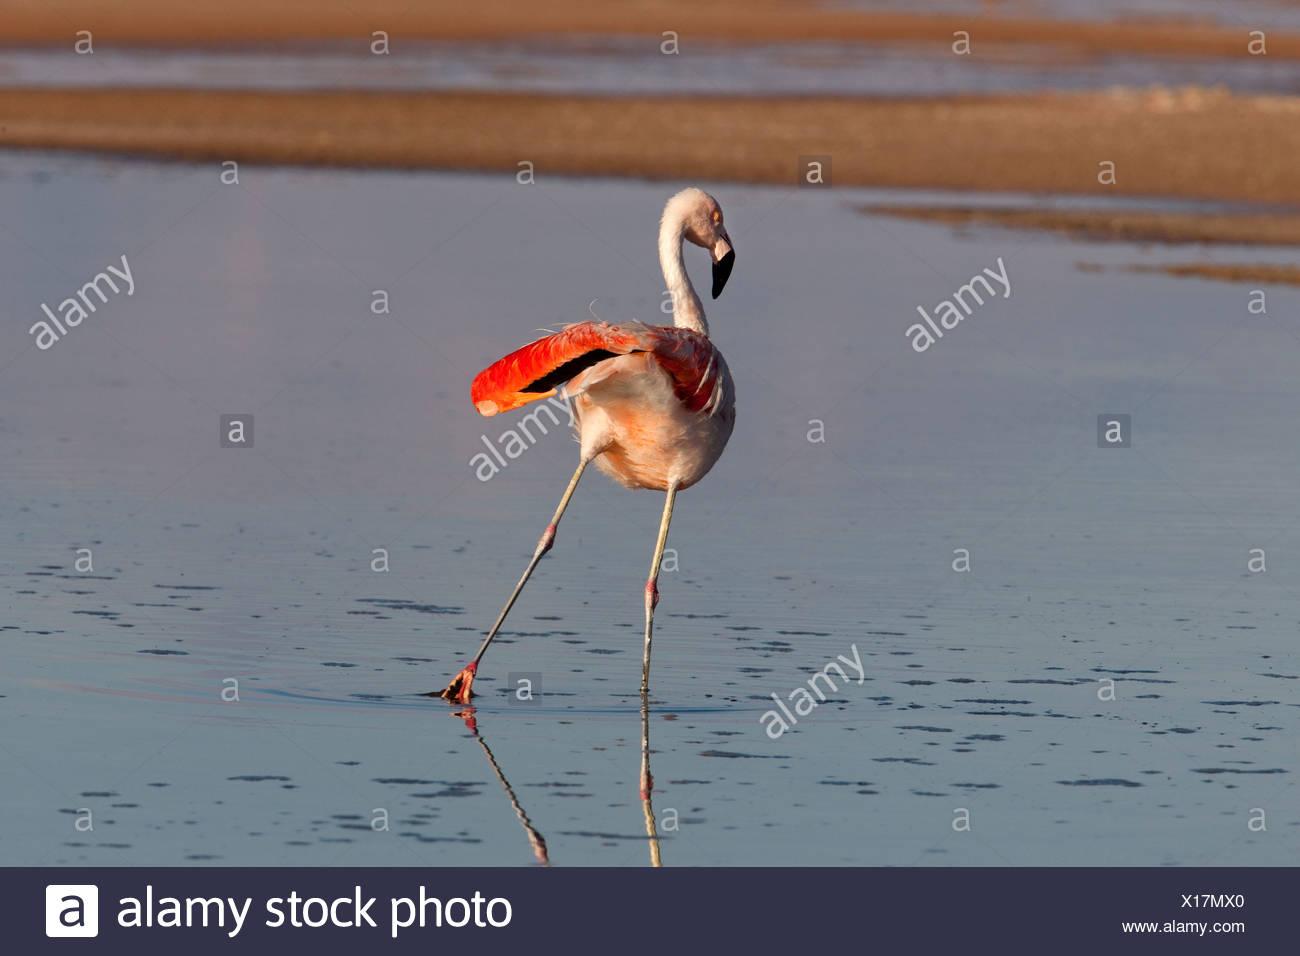 Andean Flamingo in a Salt Lake of the Atacama Desert, Chile Stock Photo